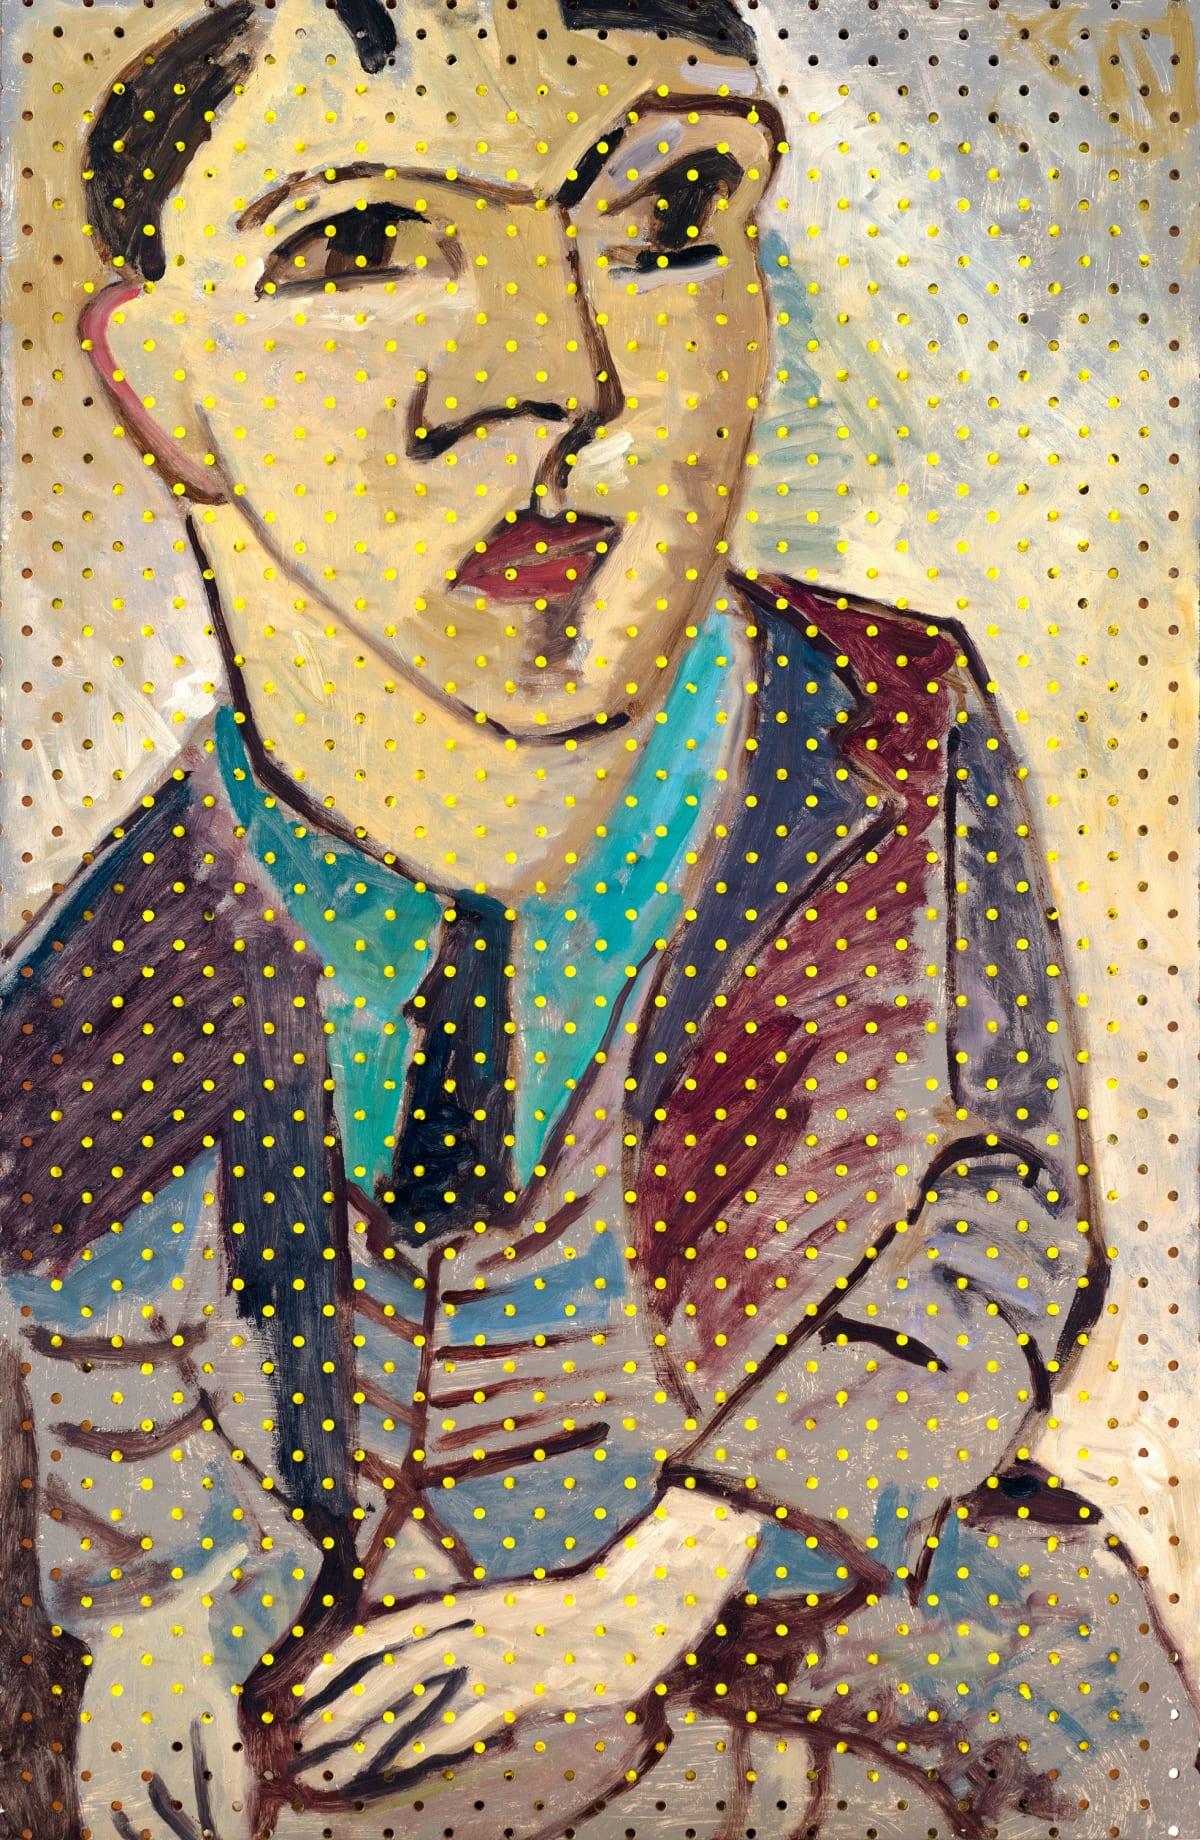 Derek Cowie Woollaston on Cadmium White, 2017 Oil on peg board 30.3 x 19.7 in 77 x 50 cm